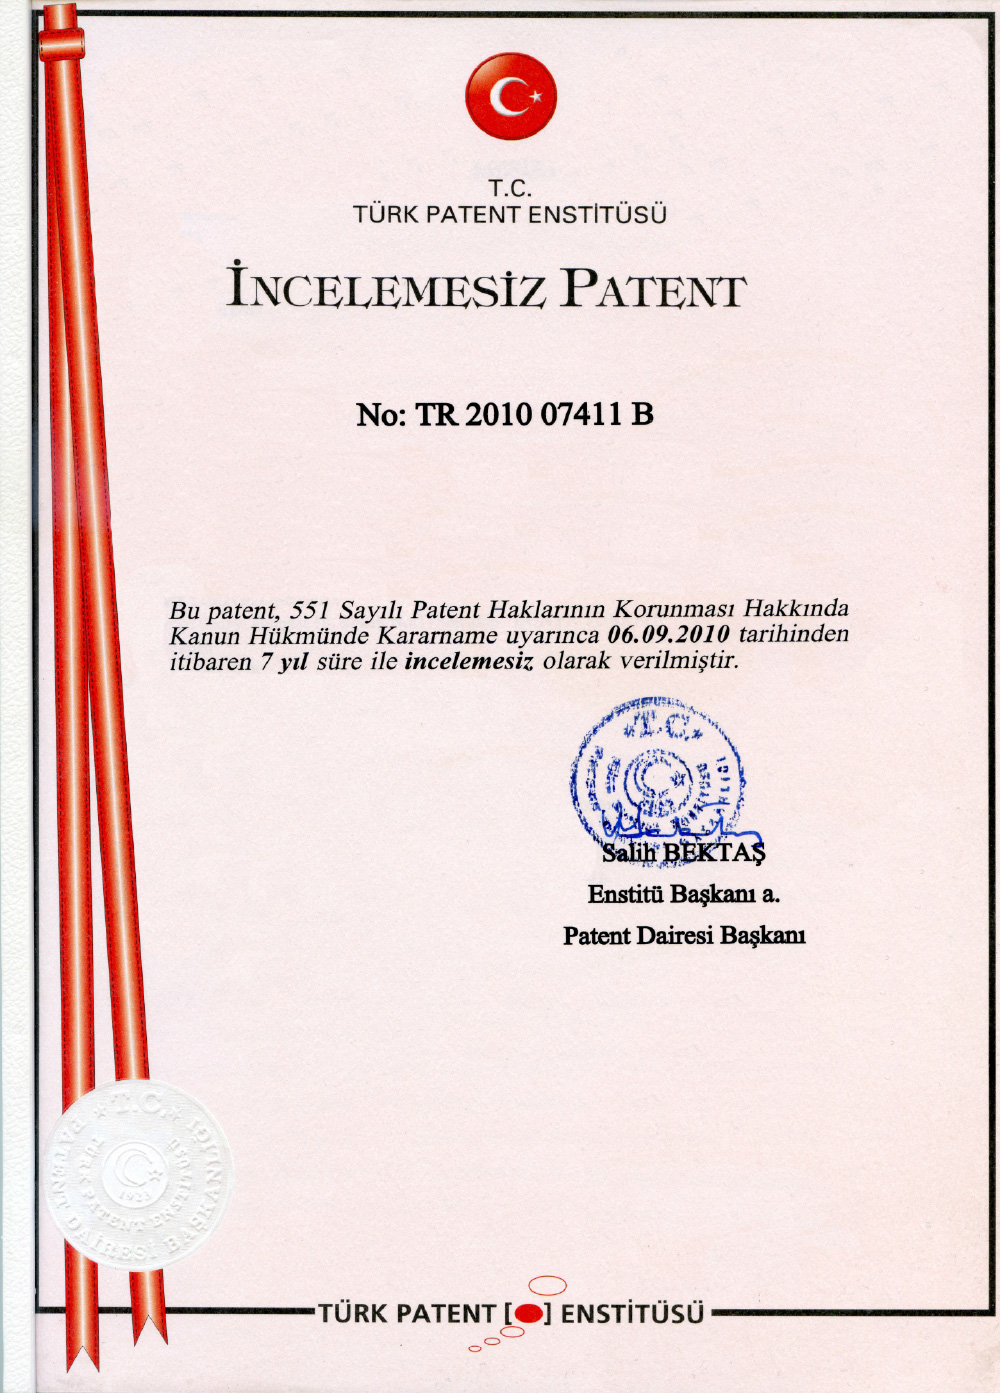 Патентный документ